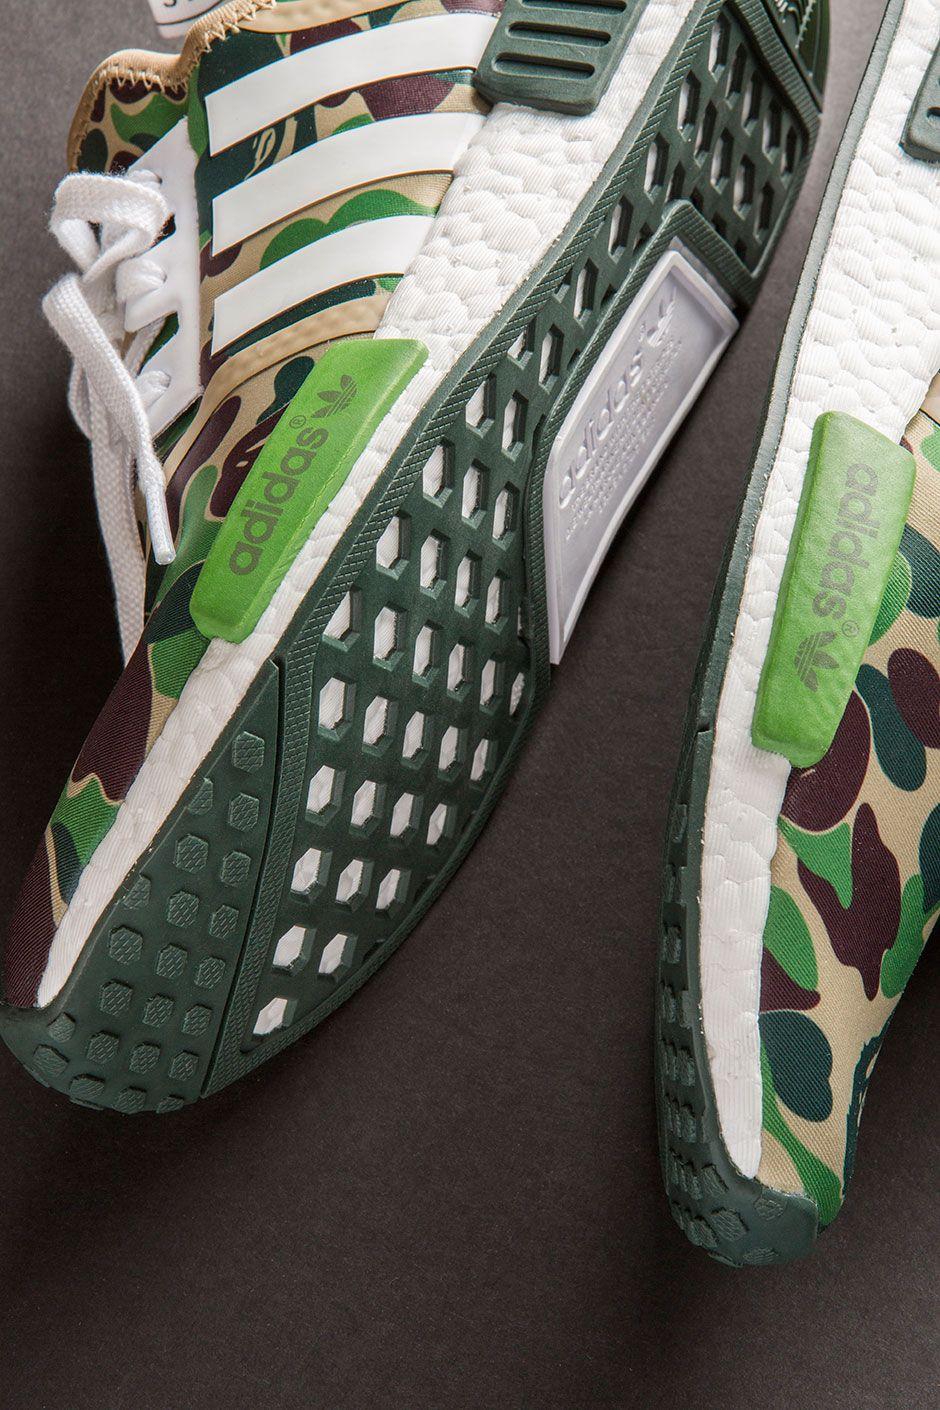 8 Collab Collection Clothing Bape X Kicks Nmd amp;9 Adidas ZoE7BhHwvw wqxSqIBX